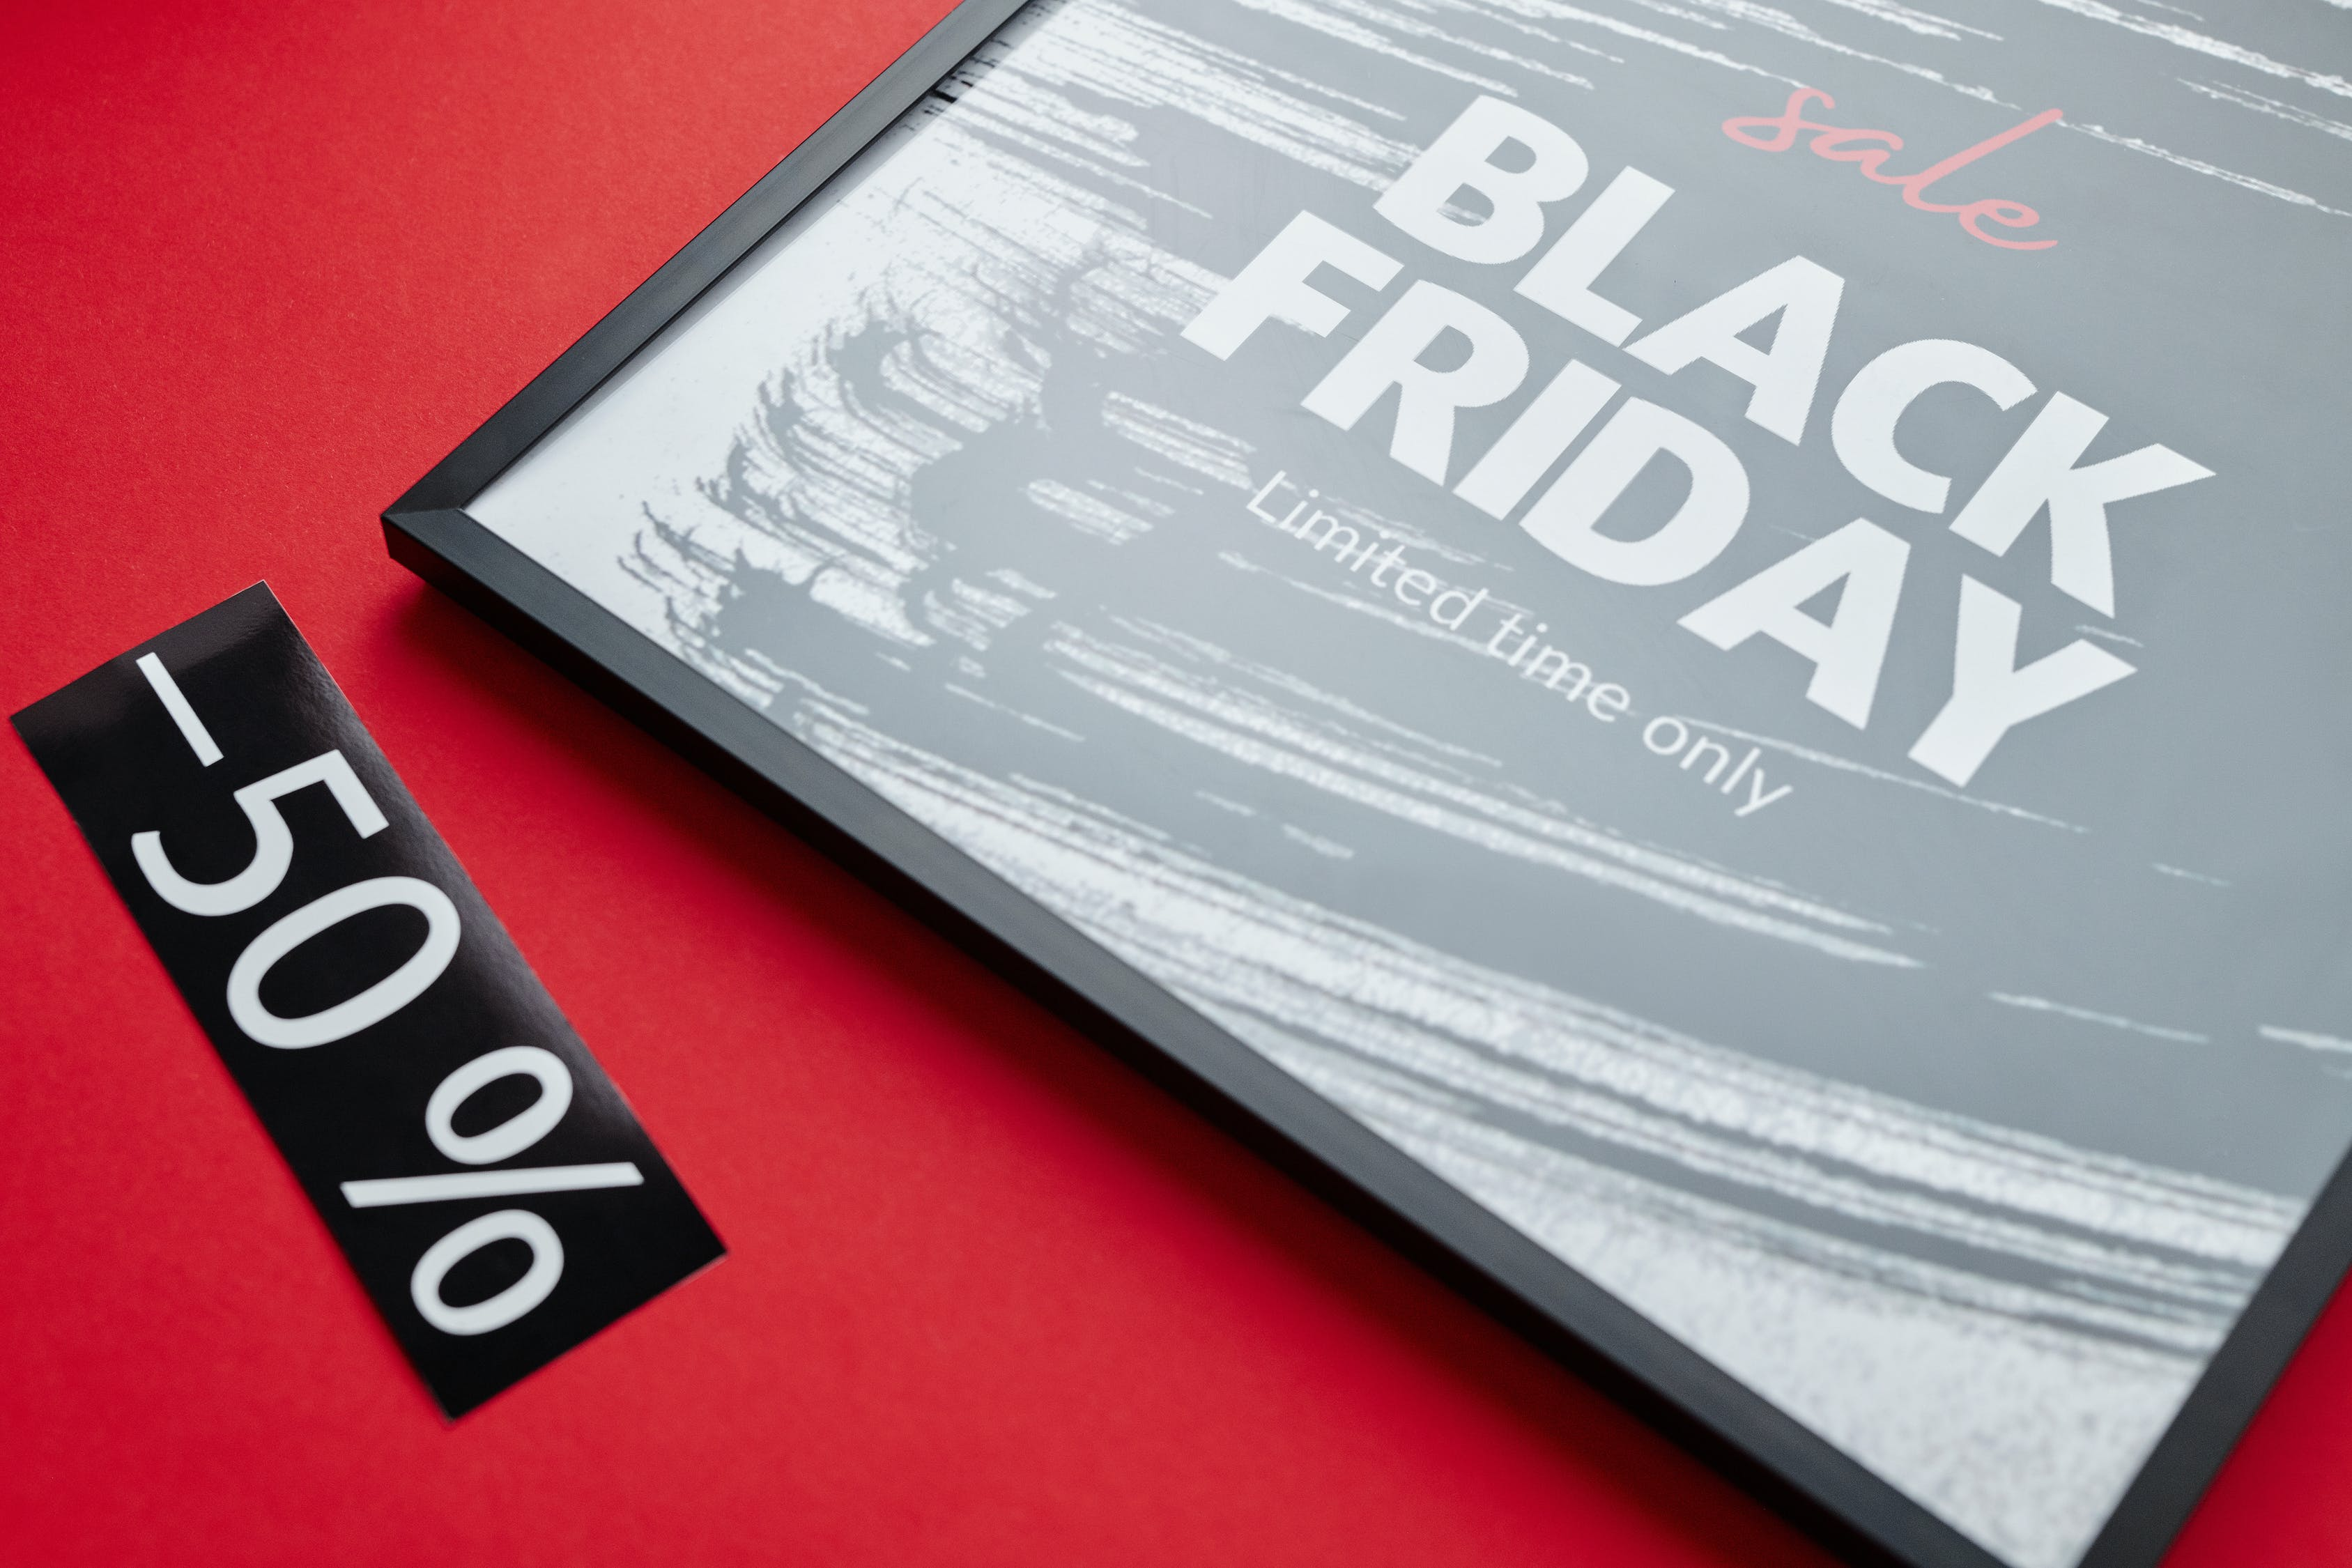 Teks Penjualan Black Friday Di Latar Belakang Merah